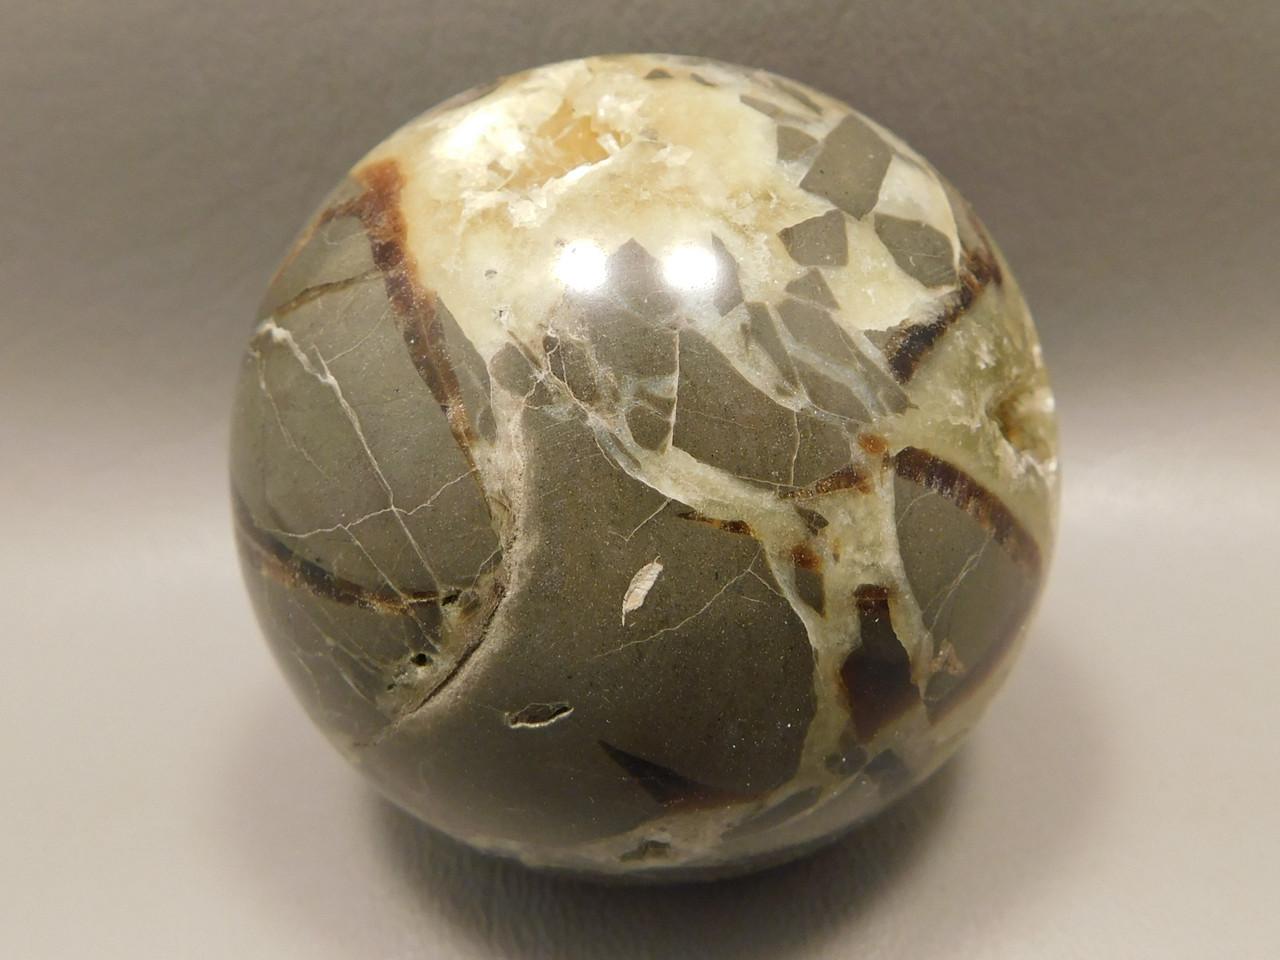 Septarian Nodule Stone 3 inch Sphere Ball Rock 78 mm Ball Utah #O6